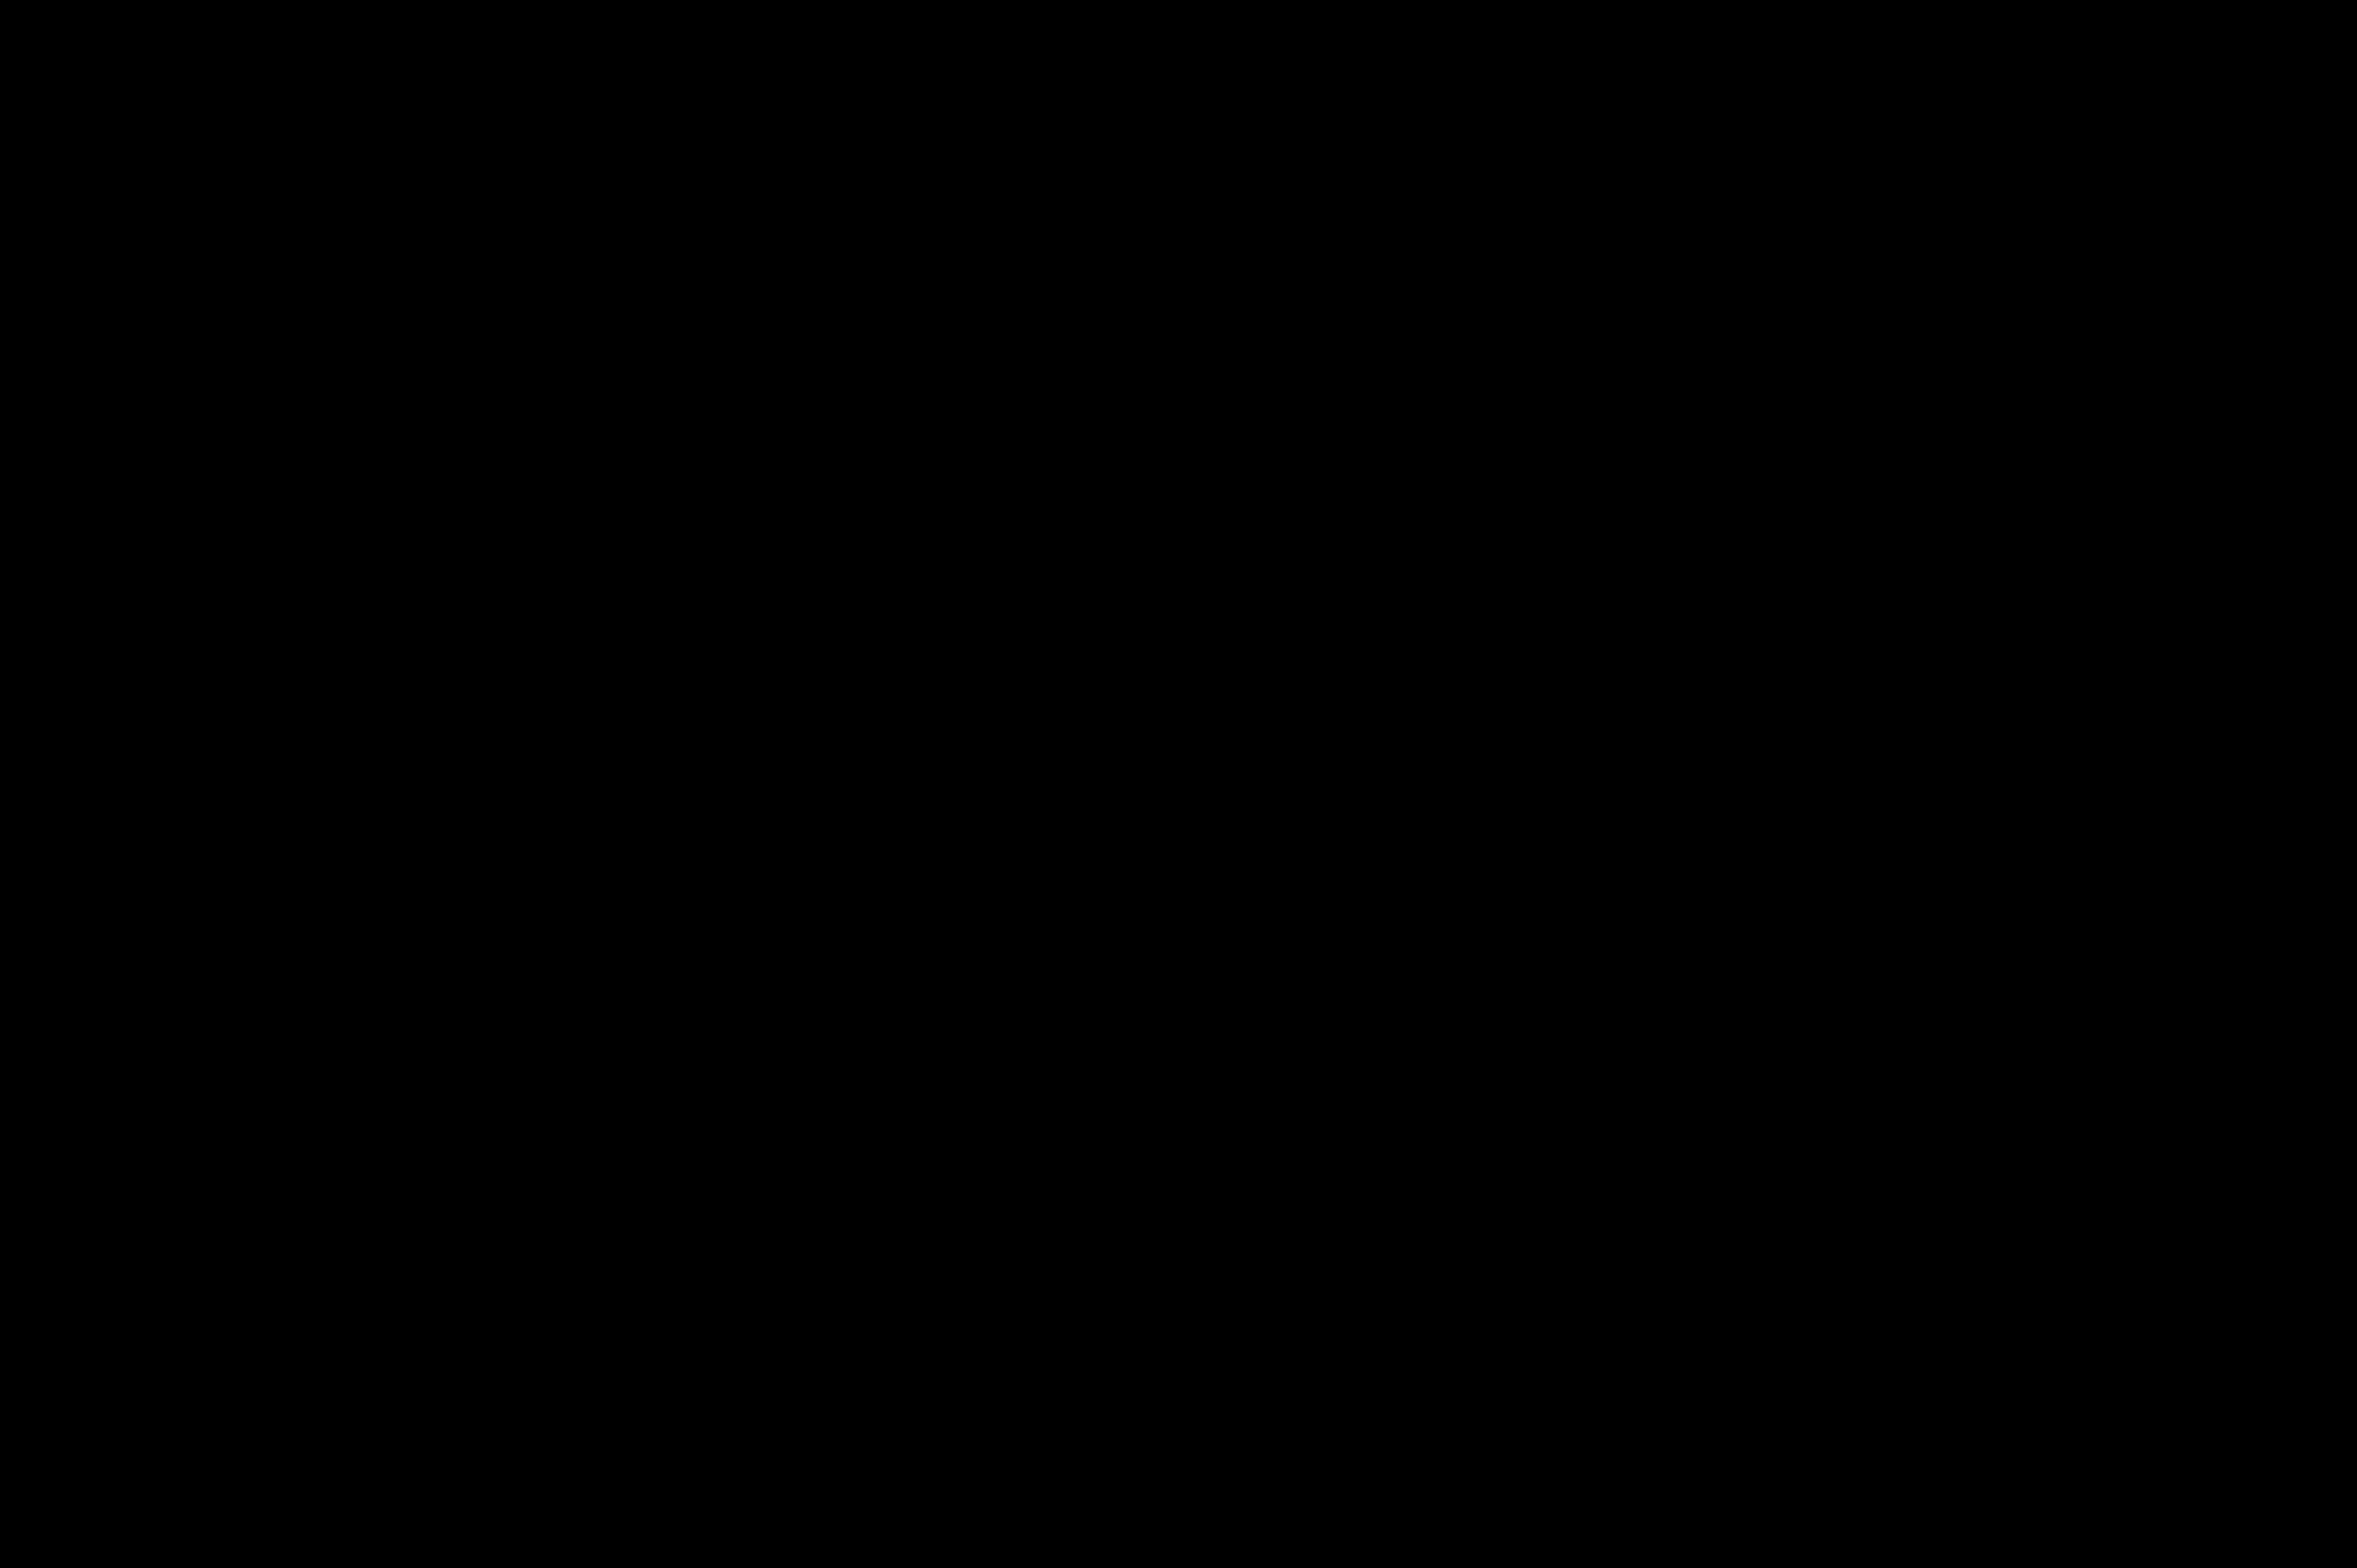 _2BP9199_A